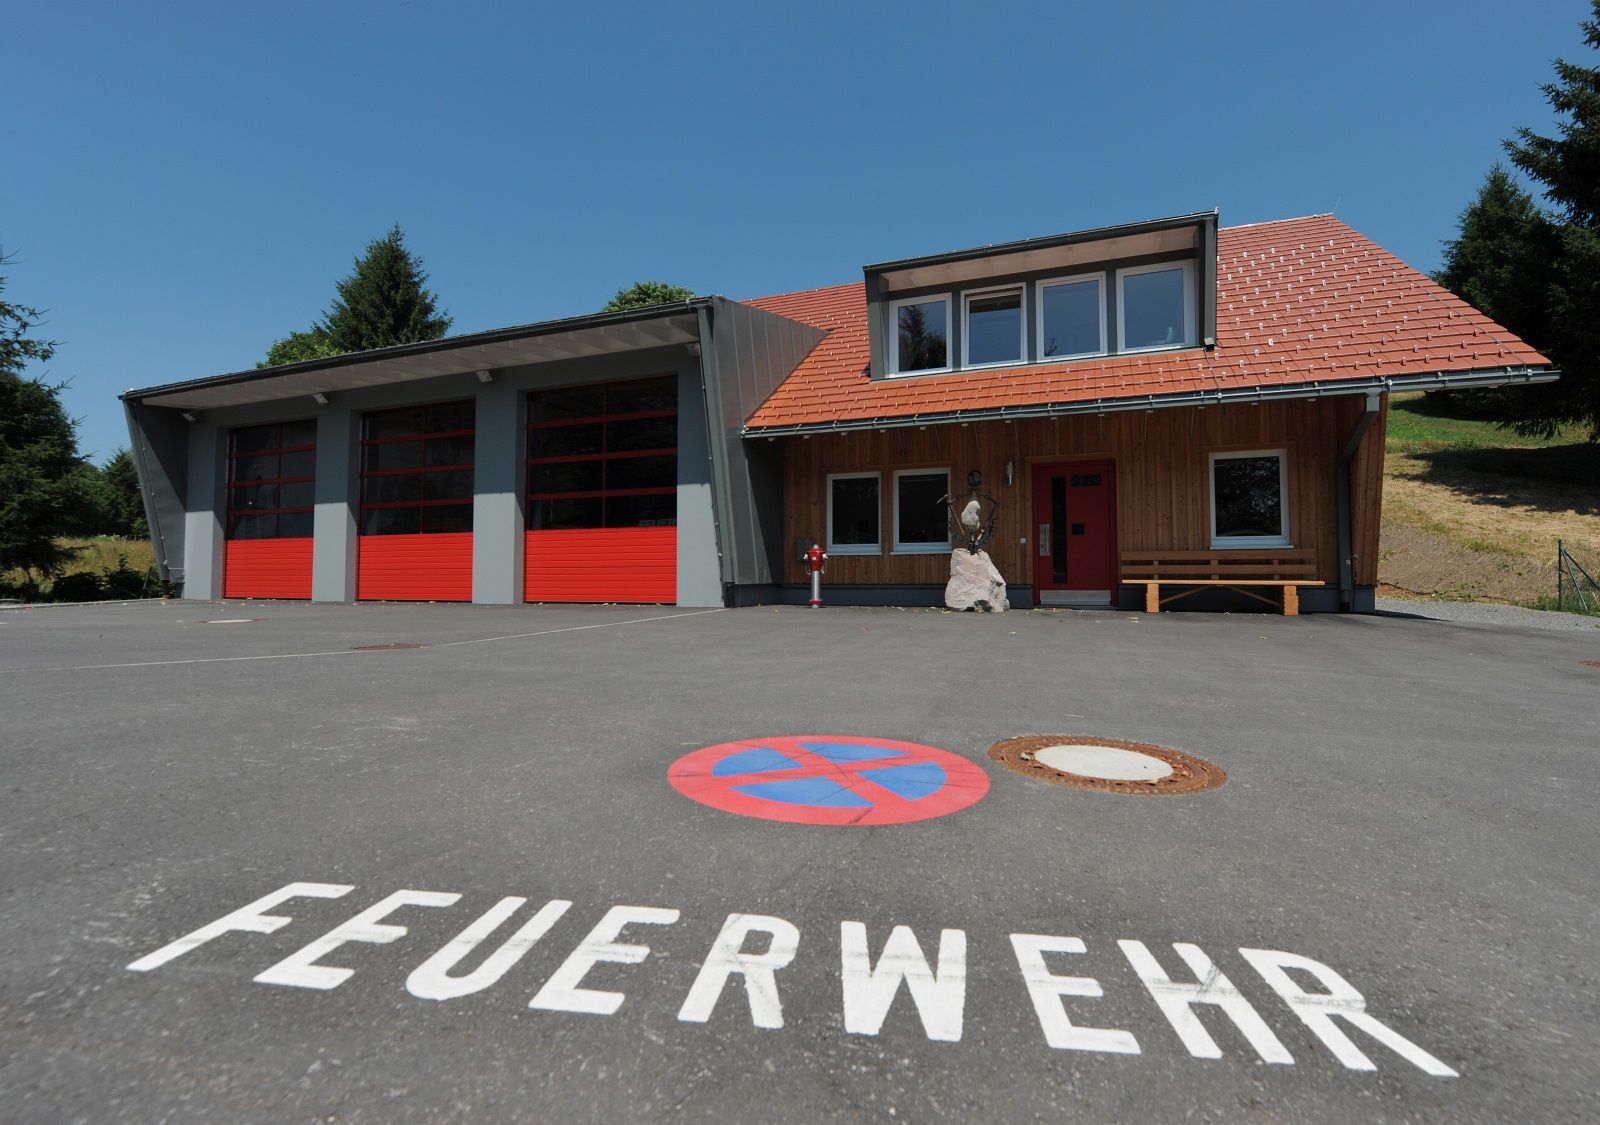 Die Feuerwehr in Gersbach